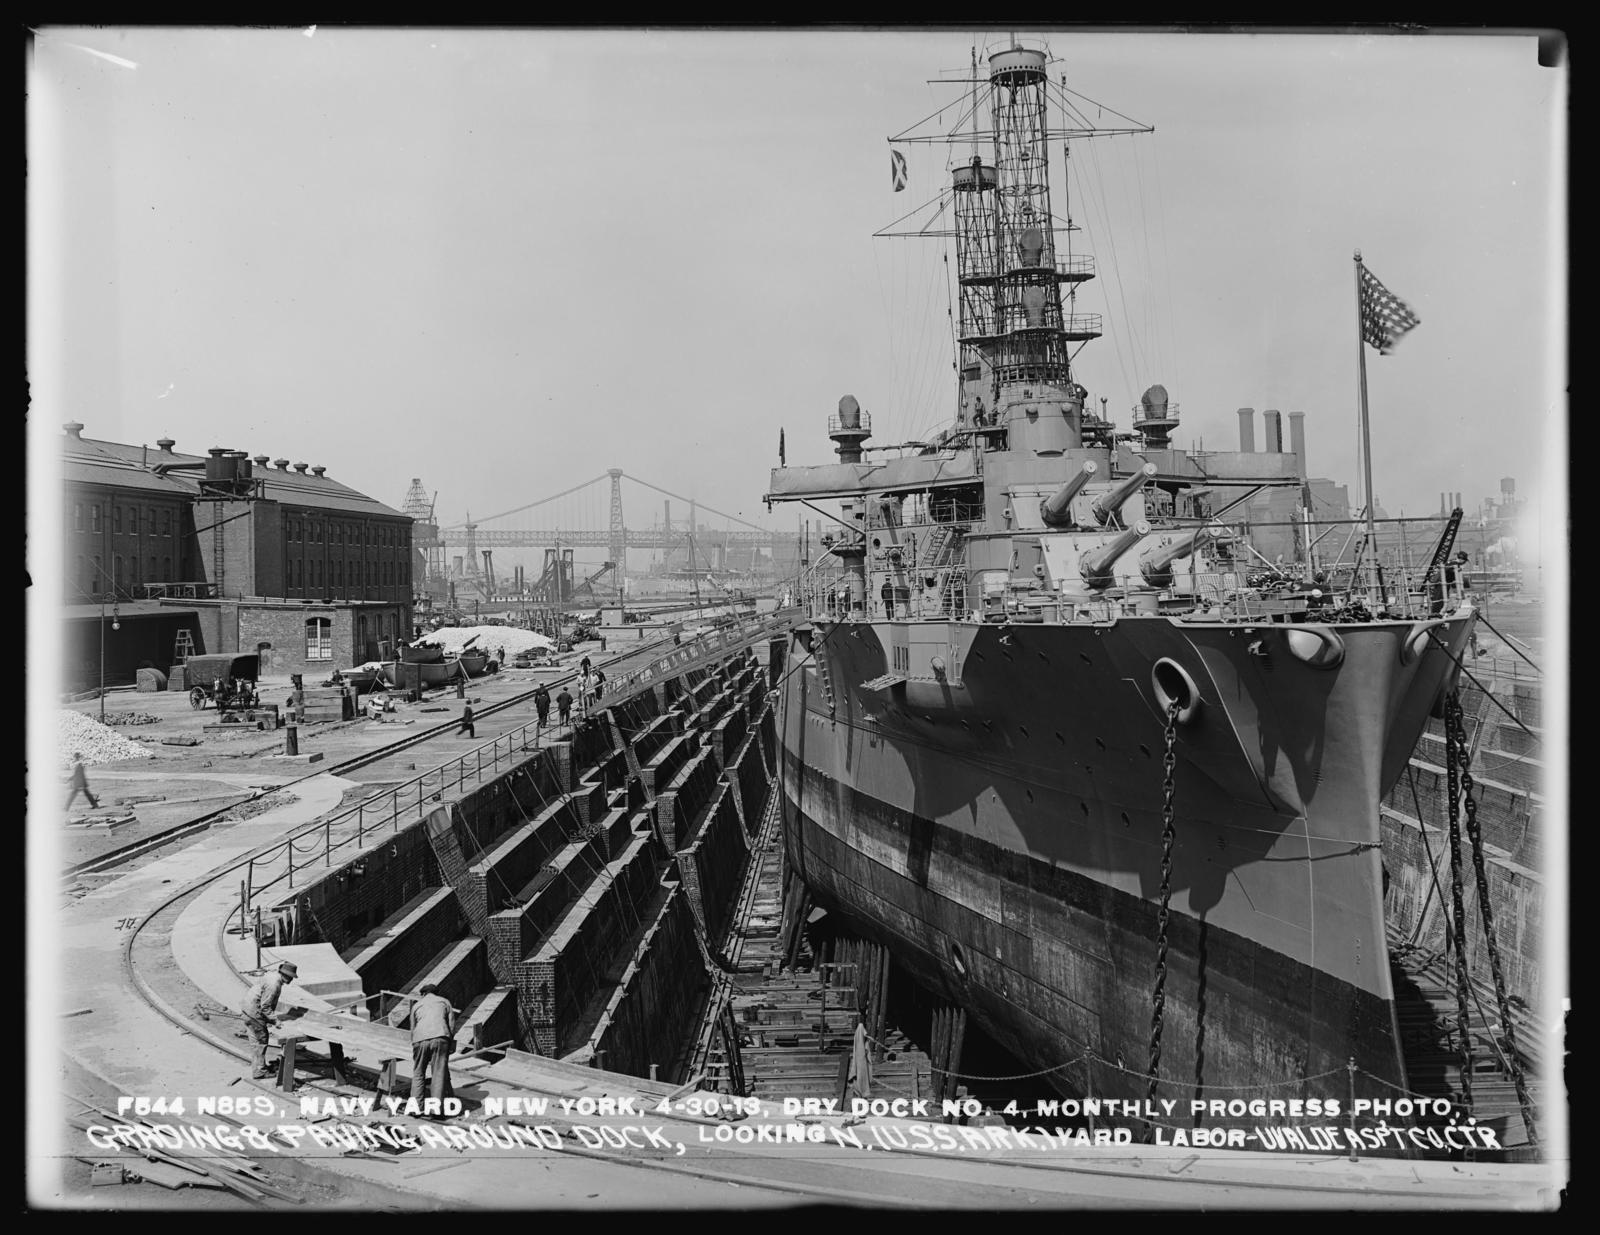 Dry Dock Number 4, Monthly Progress Photo, Grading and Paving Around Dock, Looking North (USS Arkansas) Yard Labor - Uvalde Asphalt Company, Contractor